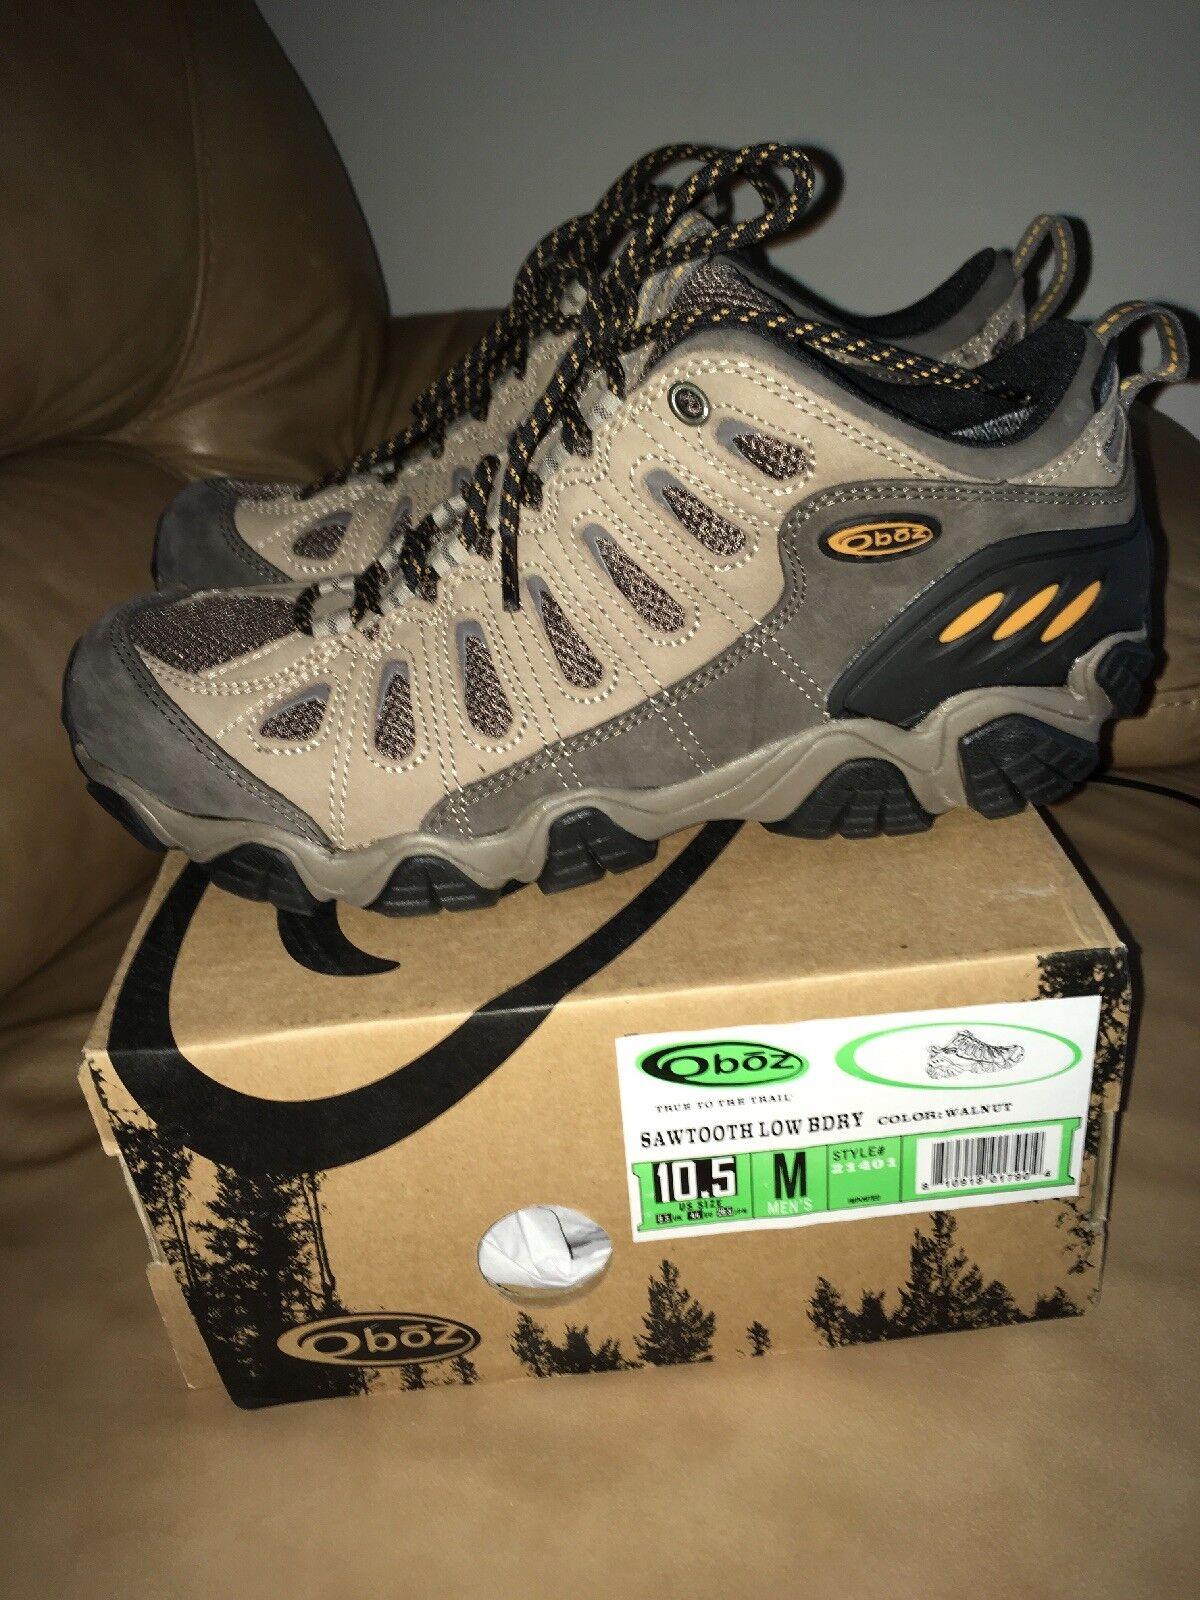 New Oboz Men's Sawtooth Low Bdry Multisport Hiking shoes,Walnut,10.5 M US  140